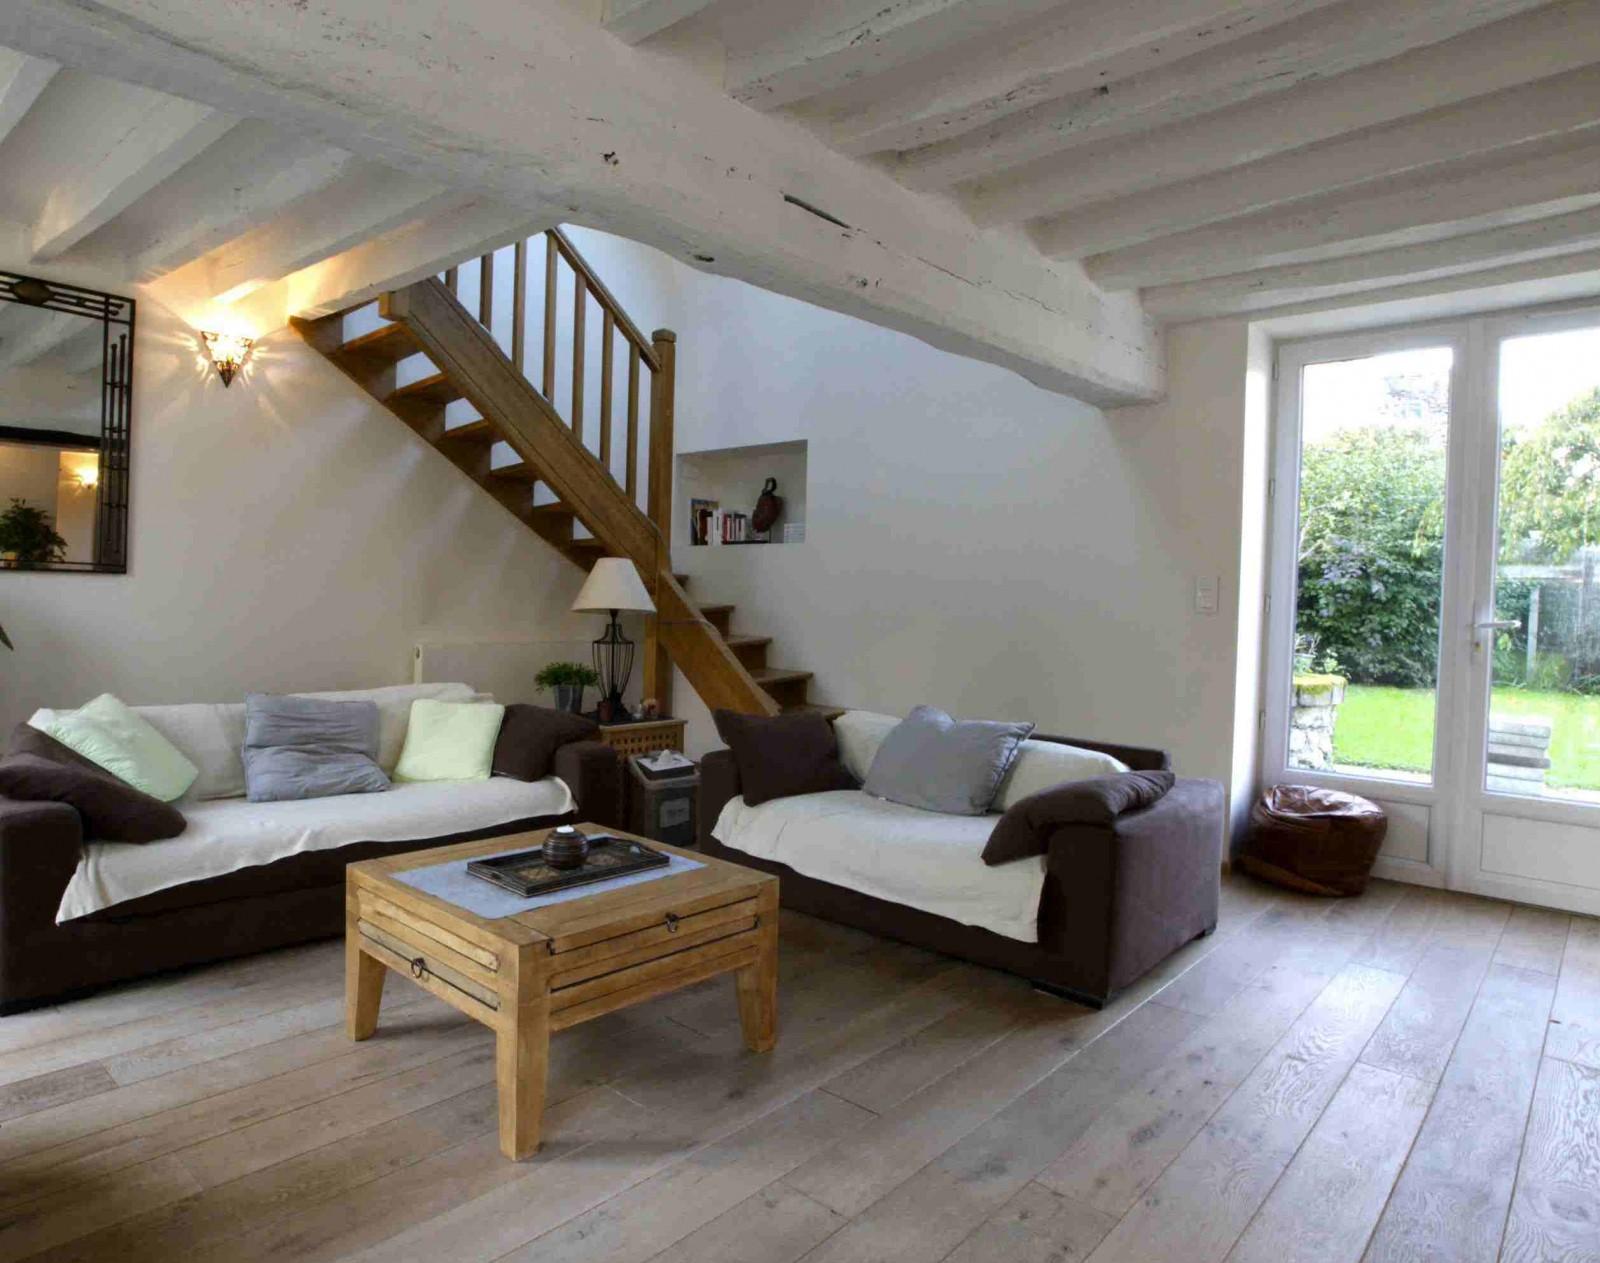 smart home in existing buildings eq 3. Black Bedroom Furniture Sets. Home Design Ideas